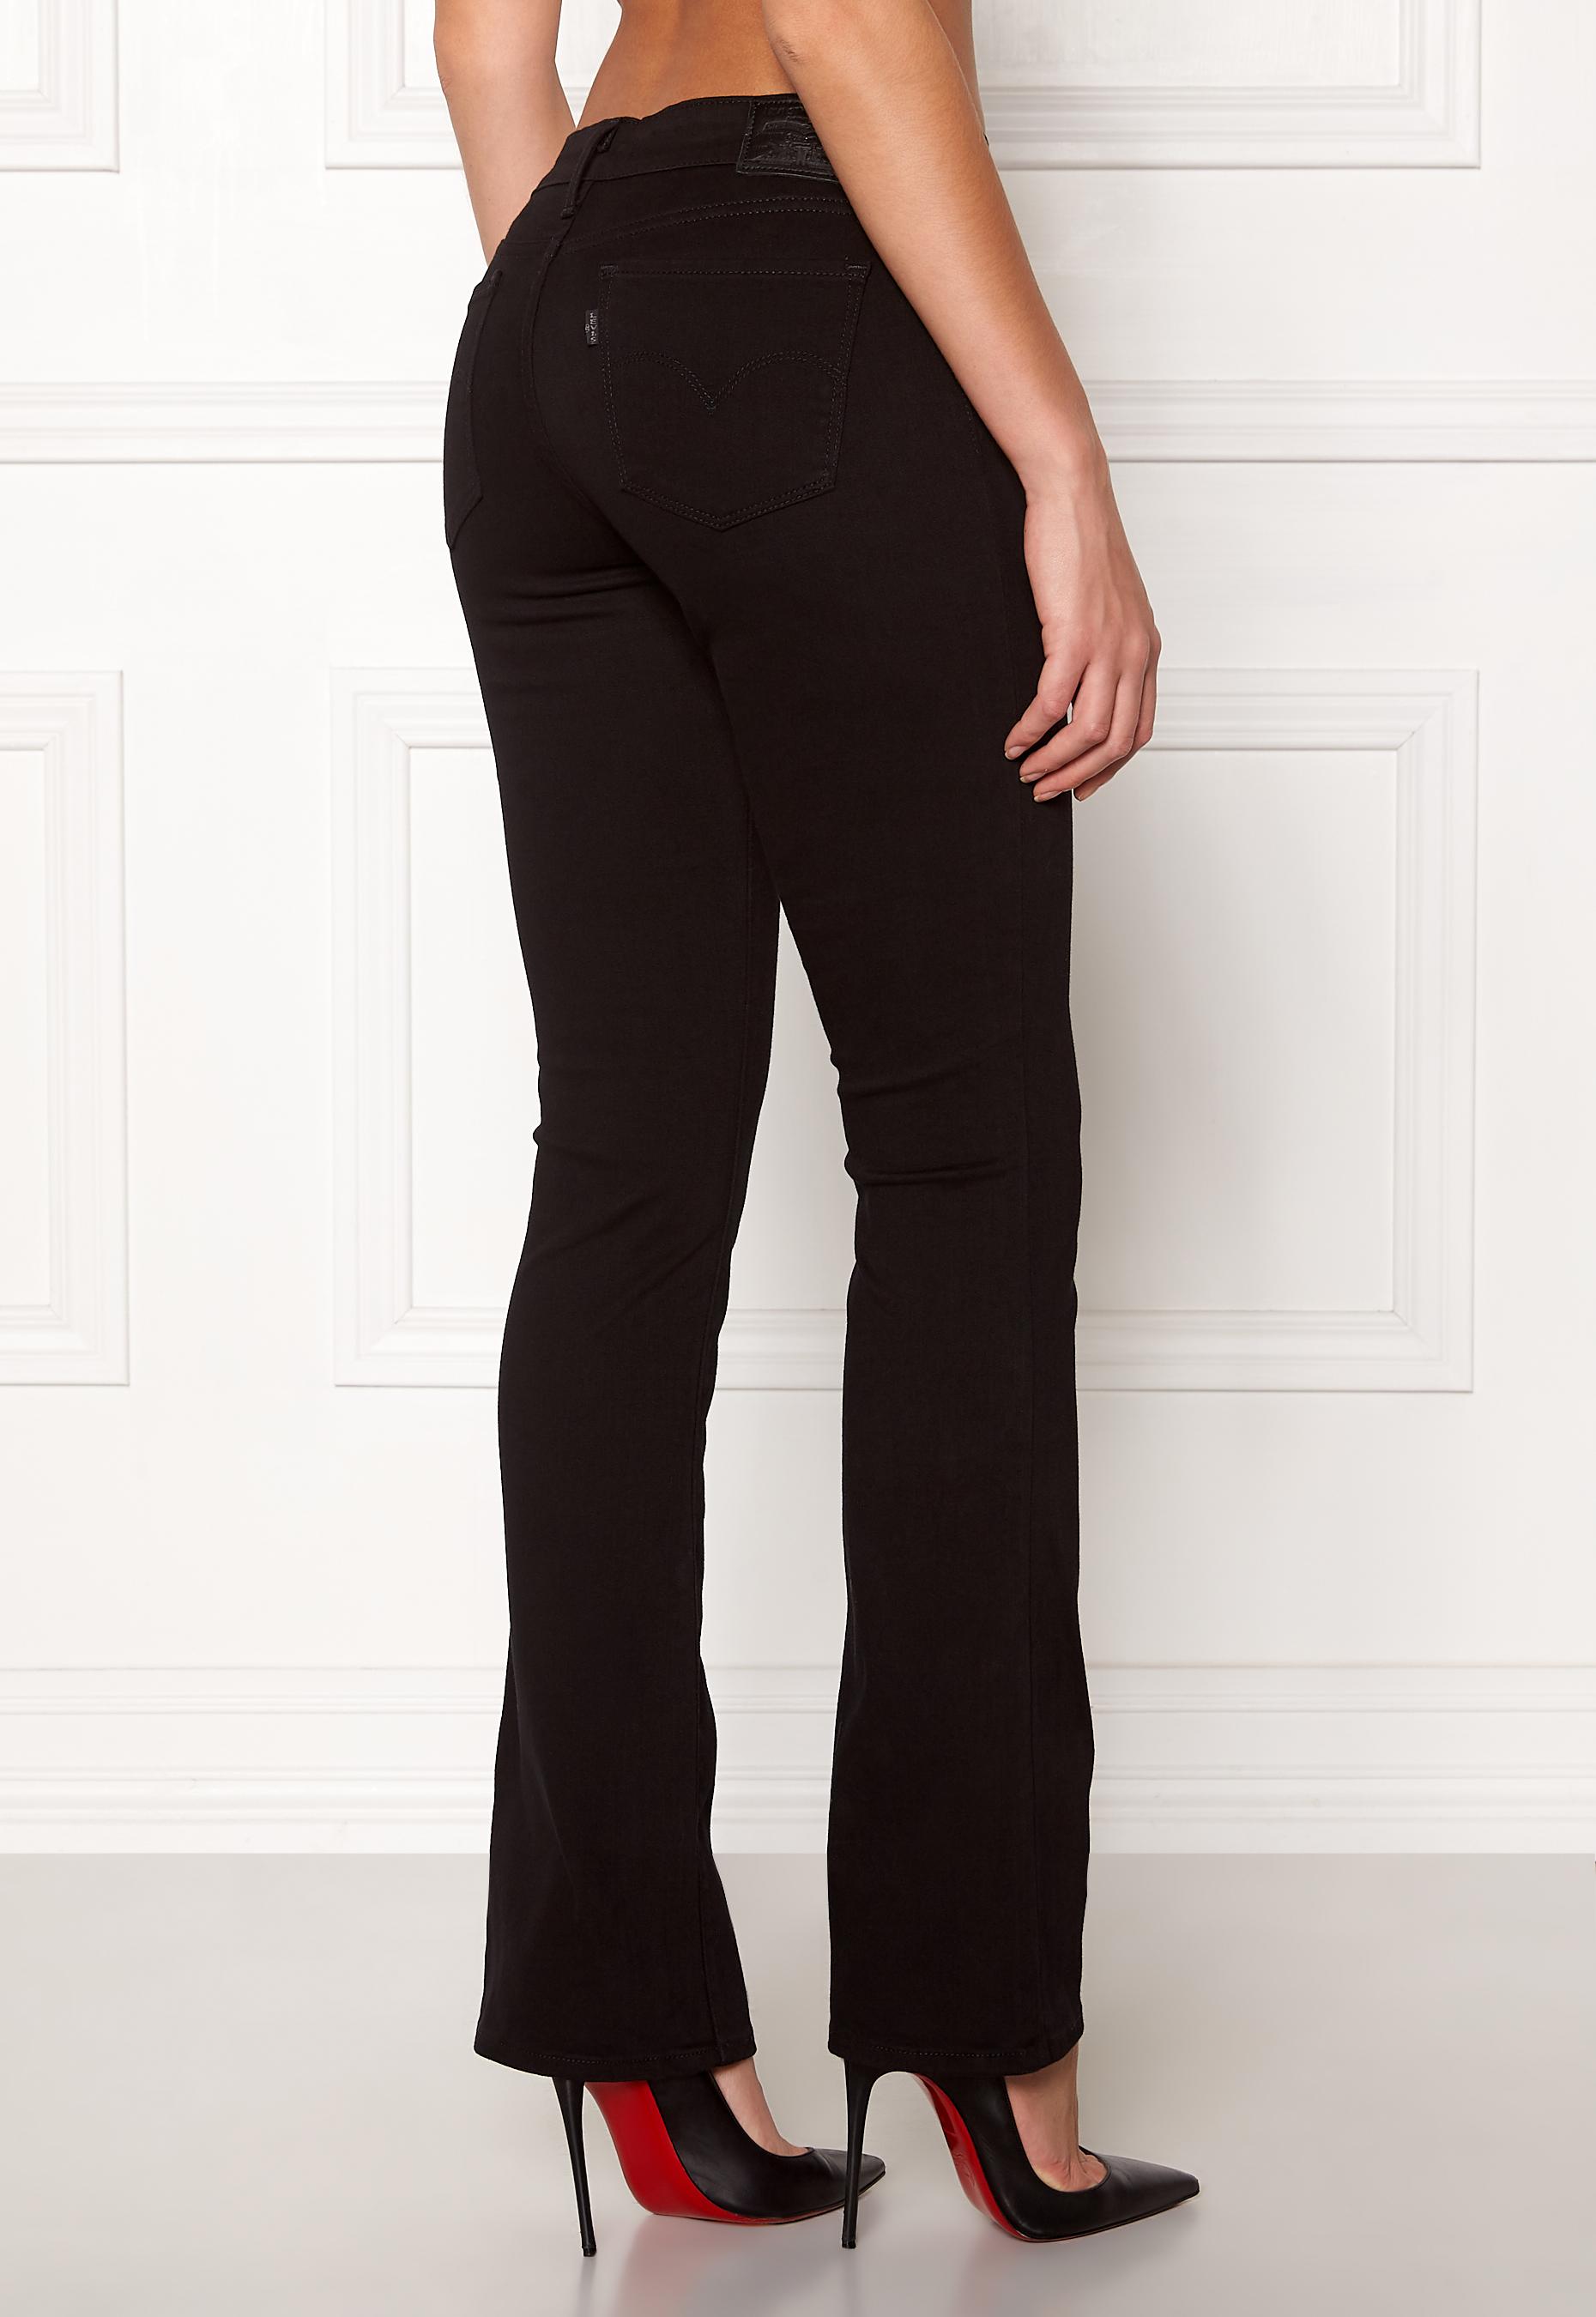 e9e882472bf LEVI'S 715 Bootcut Jeans 0017 Black Sheep - Bubbleroom